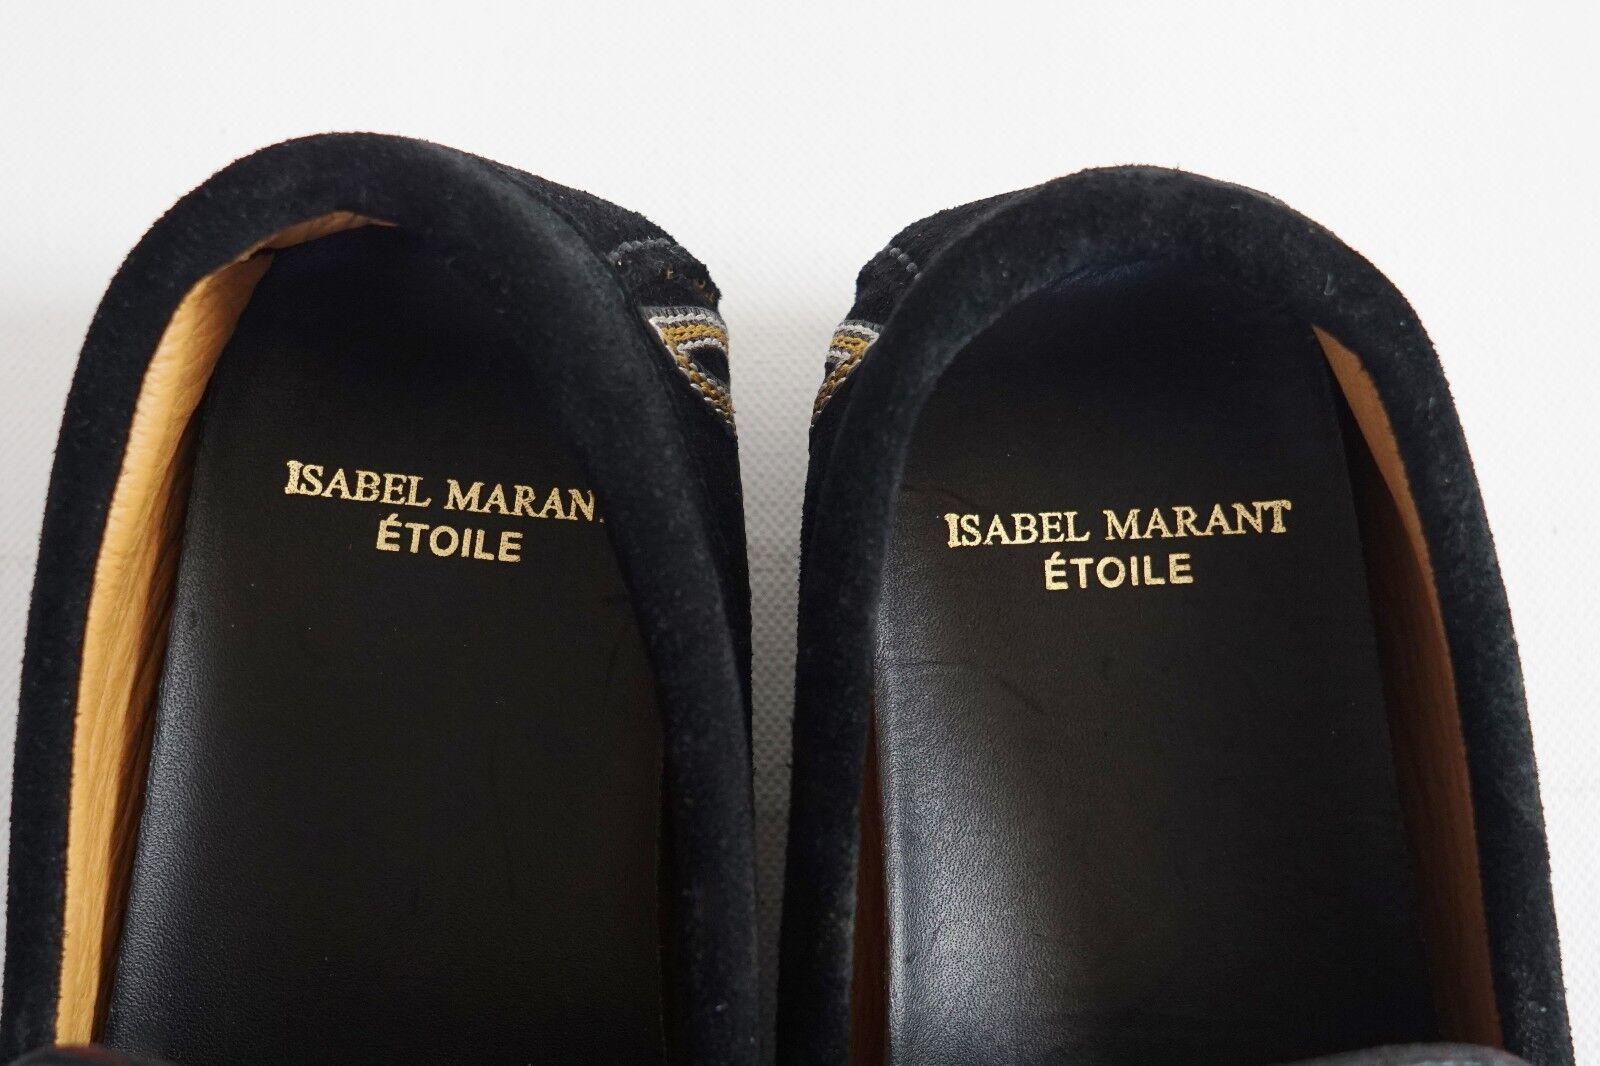 Nuevo Isabel Marant Etoile  finha finha finha  Negro Bordado Mocasines Mocasín 35 US-5 78c31d